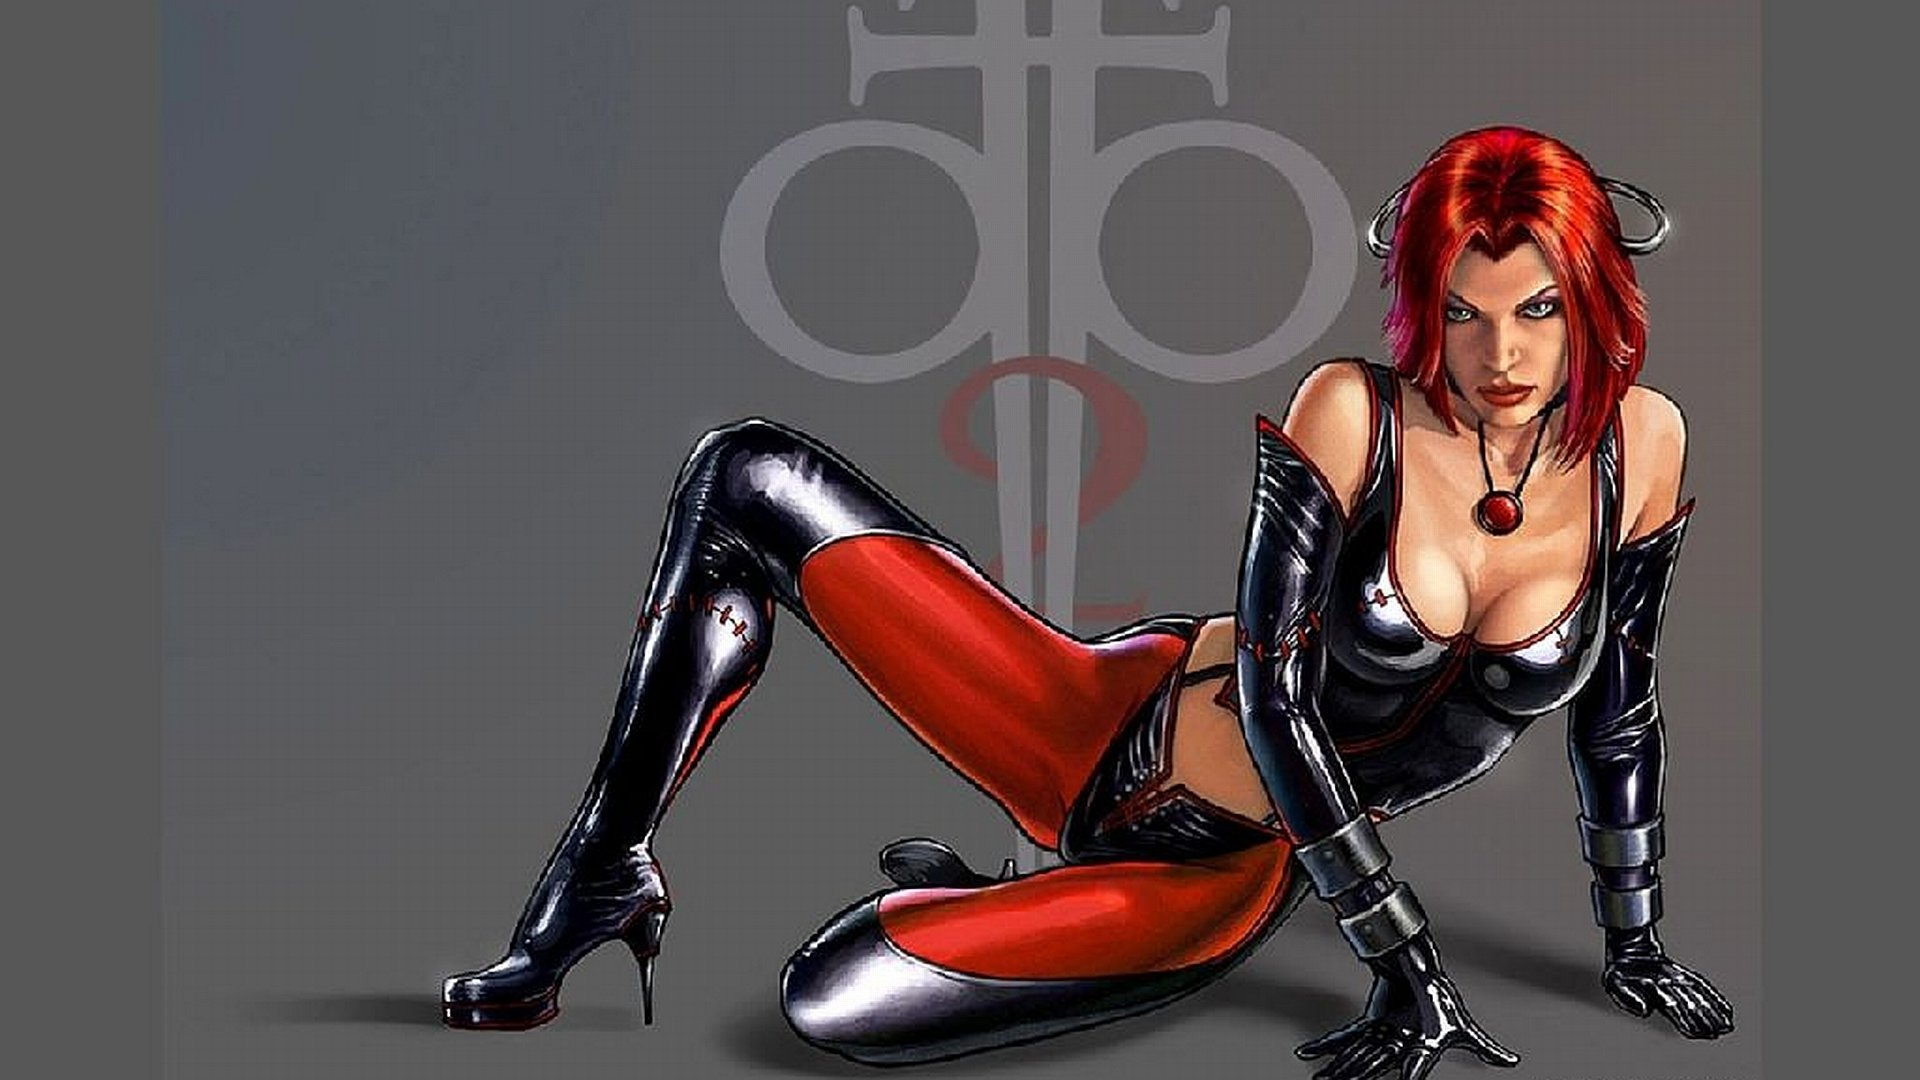 Blood rain porn erotic photo